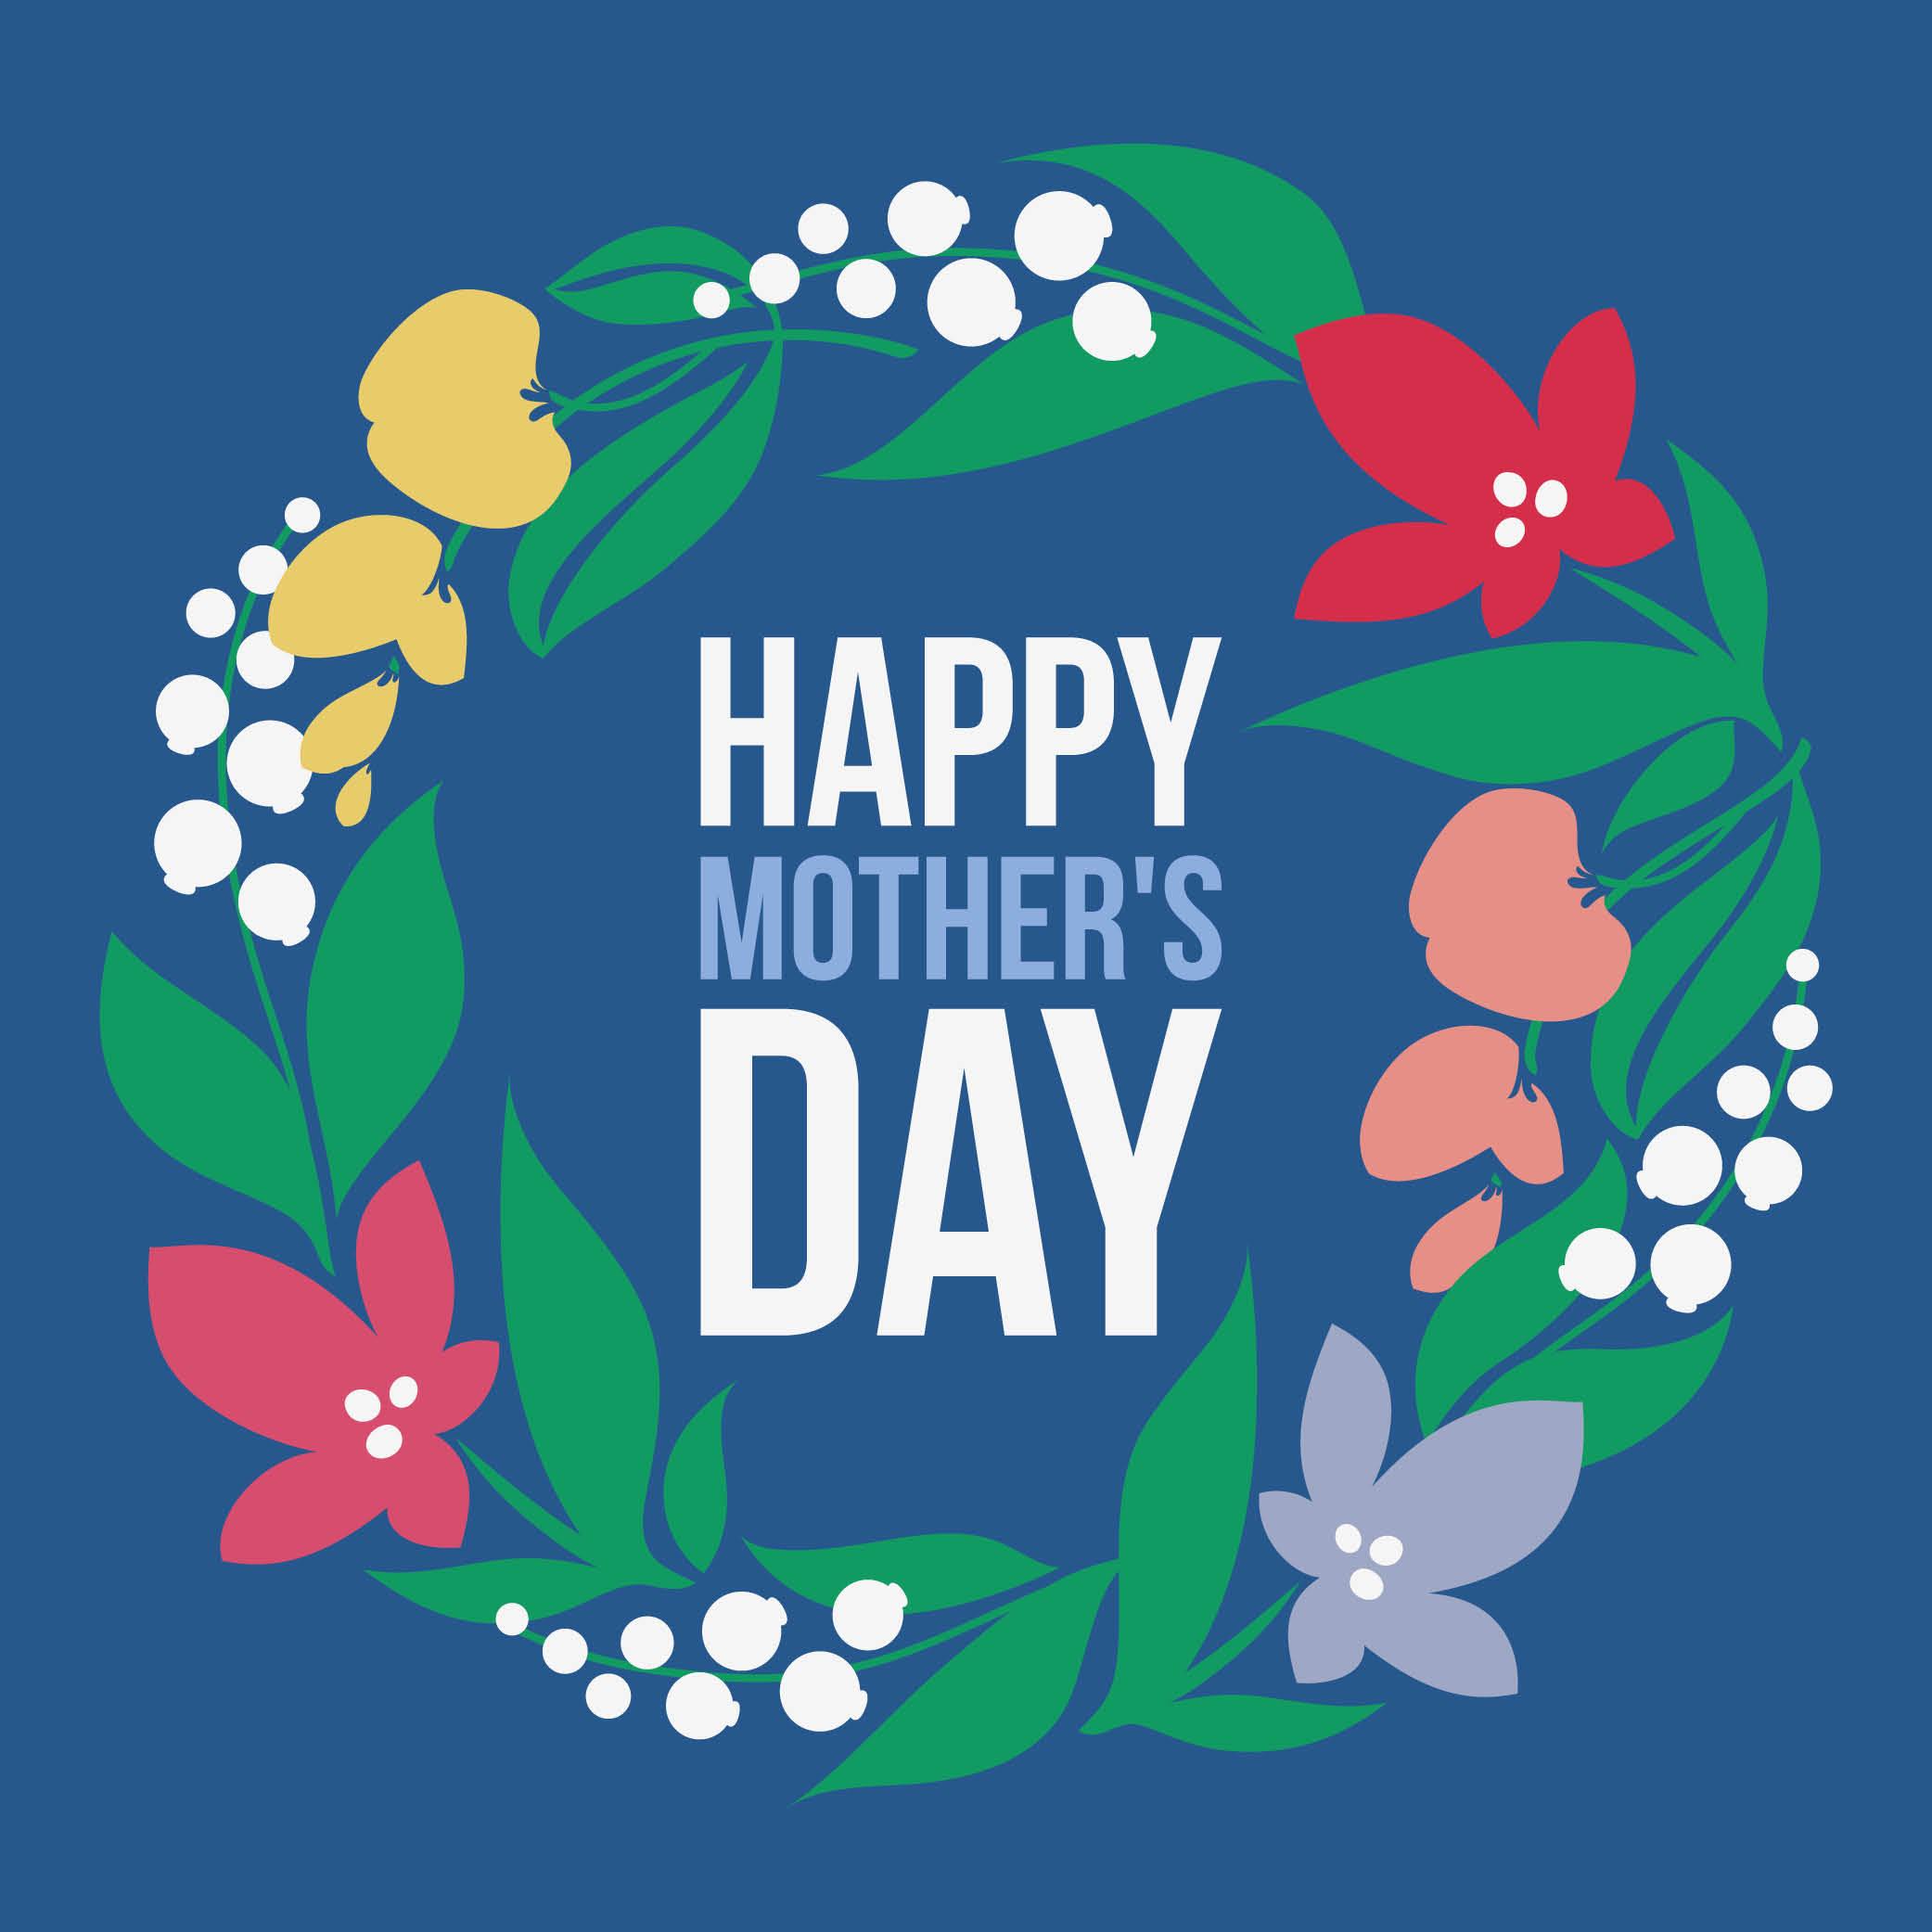 IFPOA_TributeBadge_FB_image_mothersDay_FNL.jpg